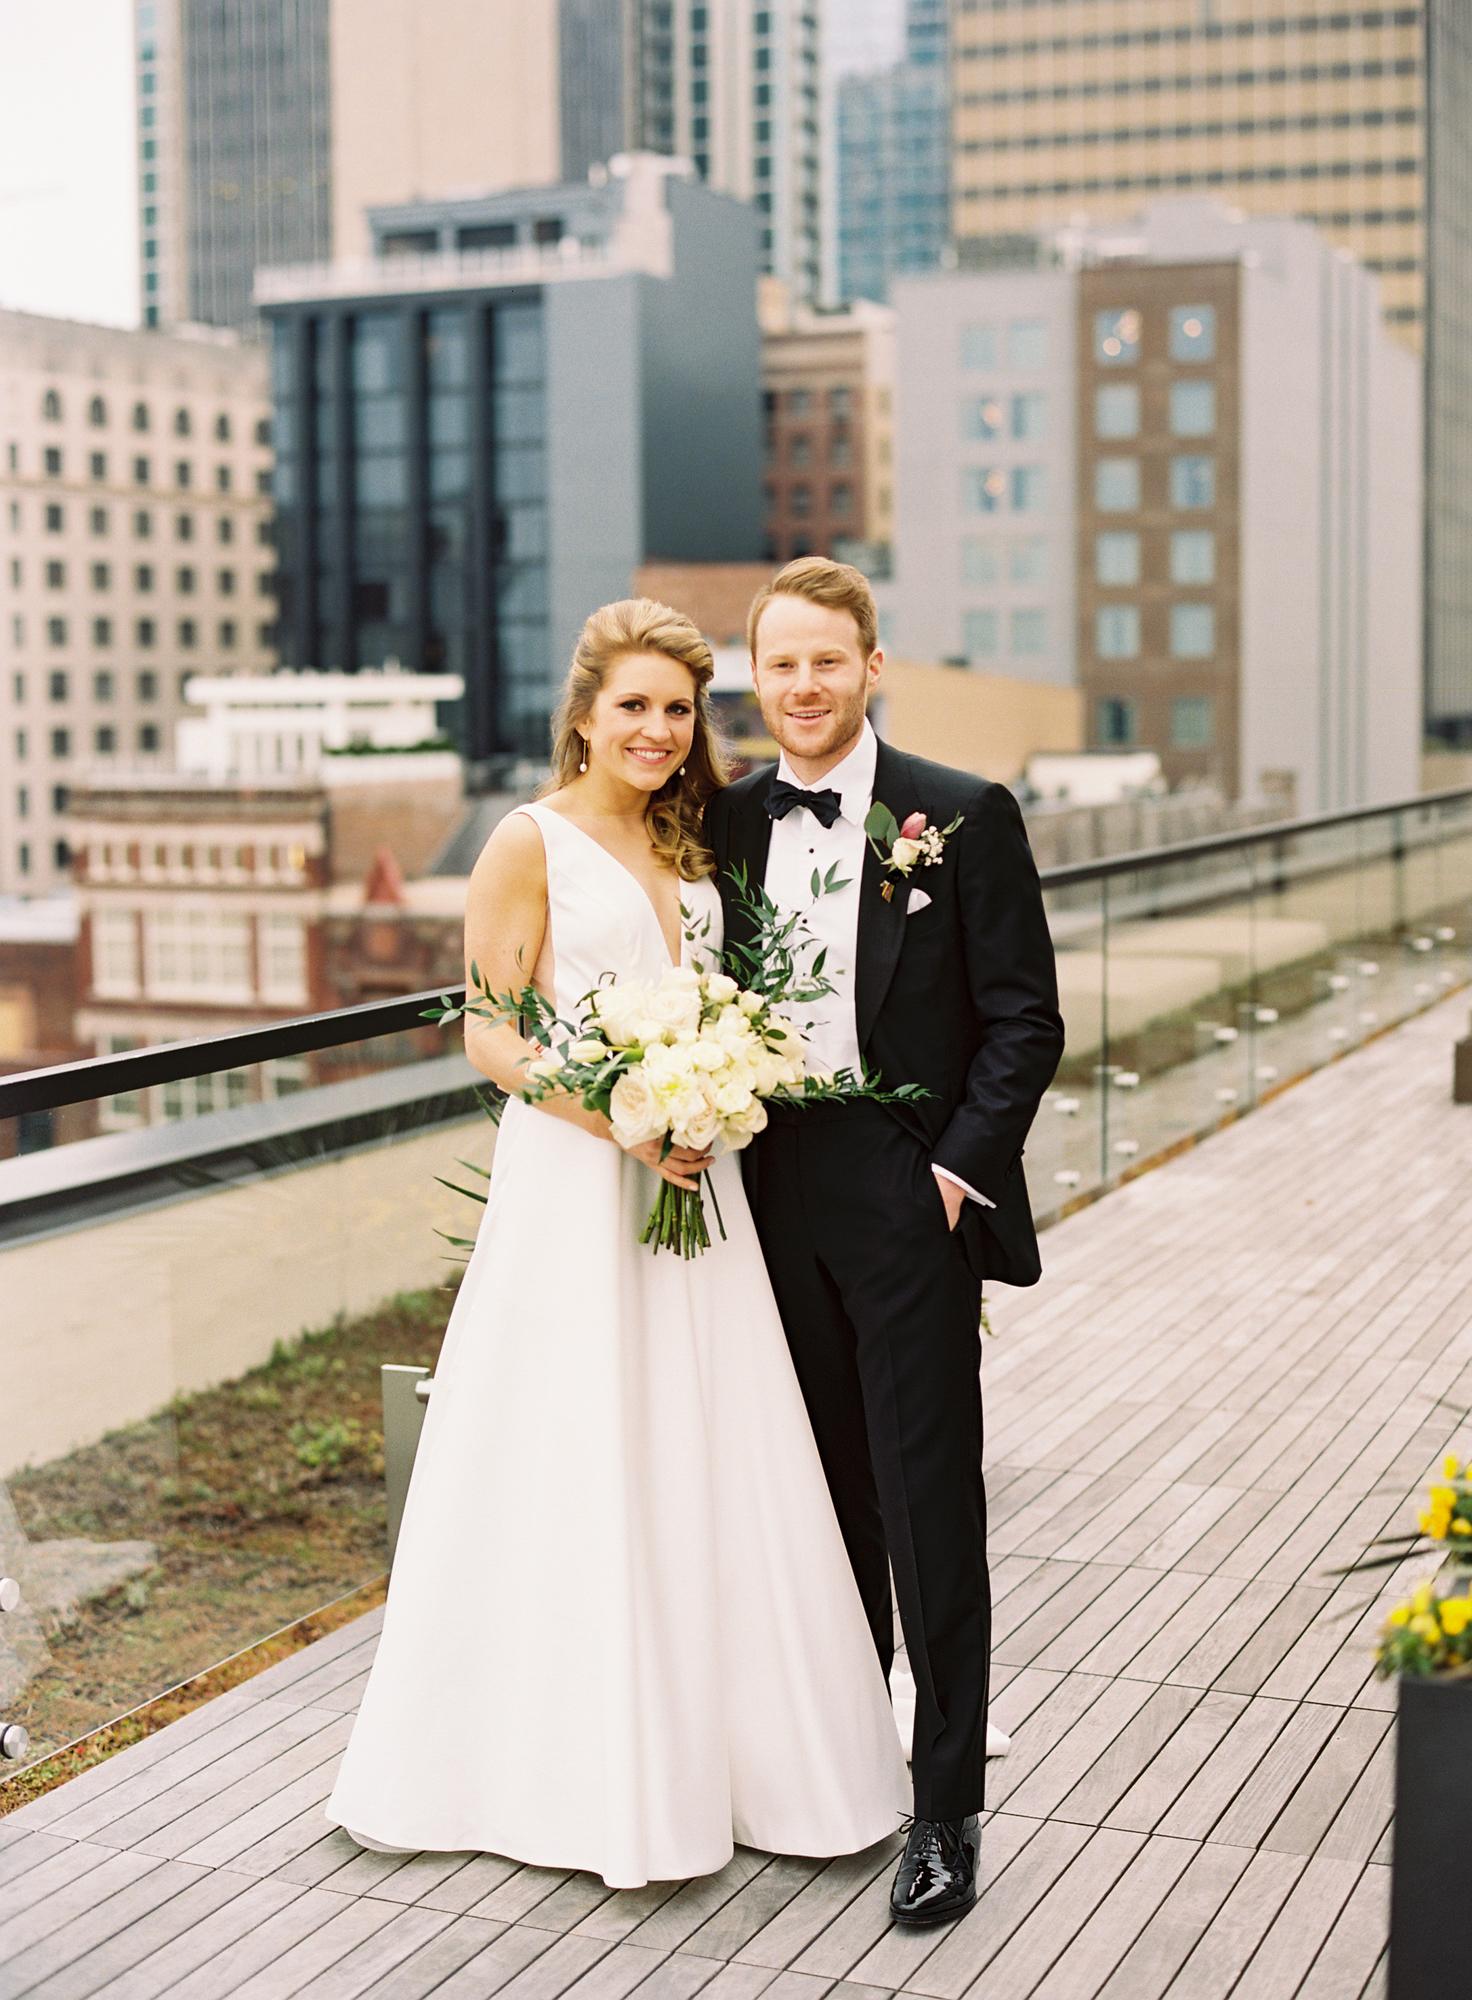 Nashville Wedding 21c Hotel and Museum-012.jpg